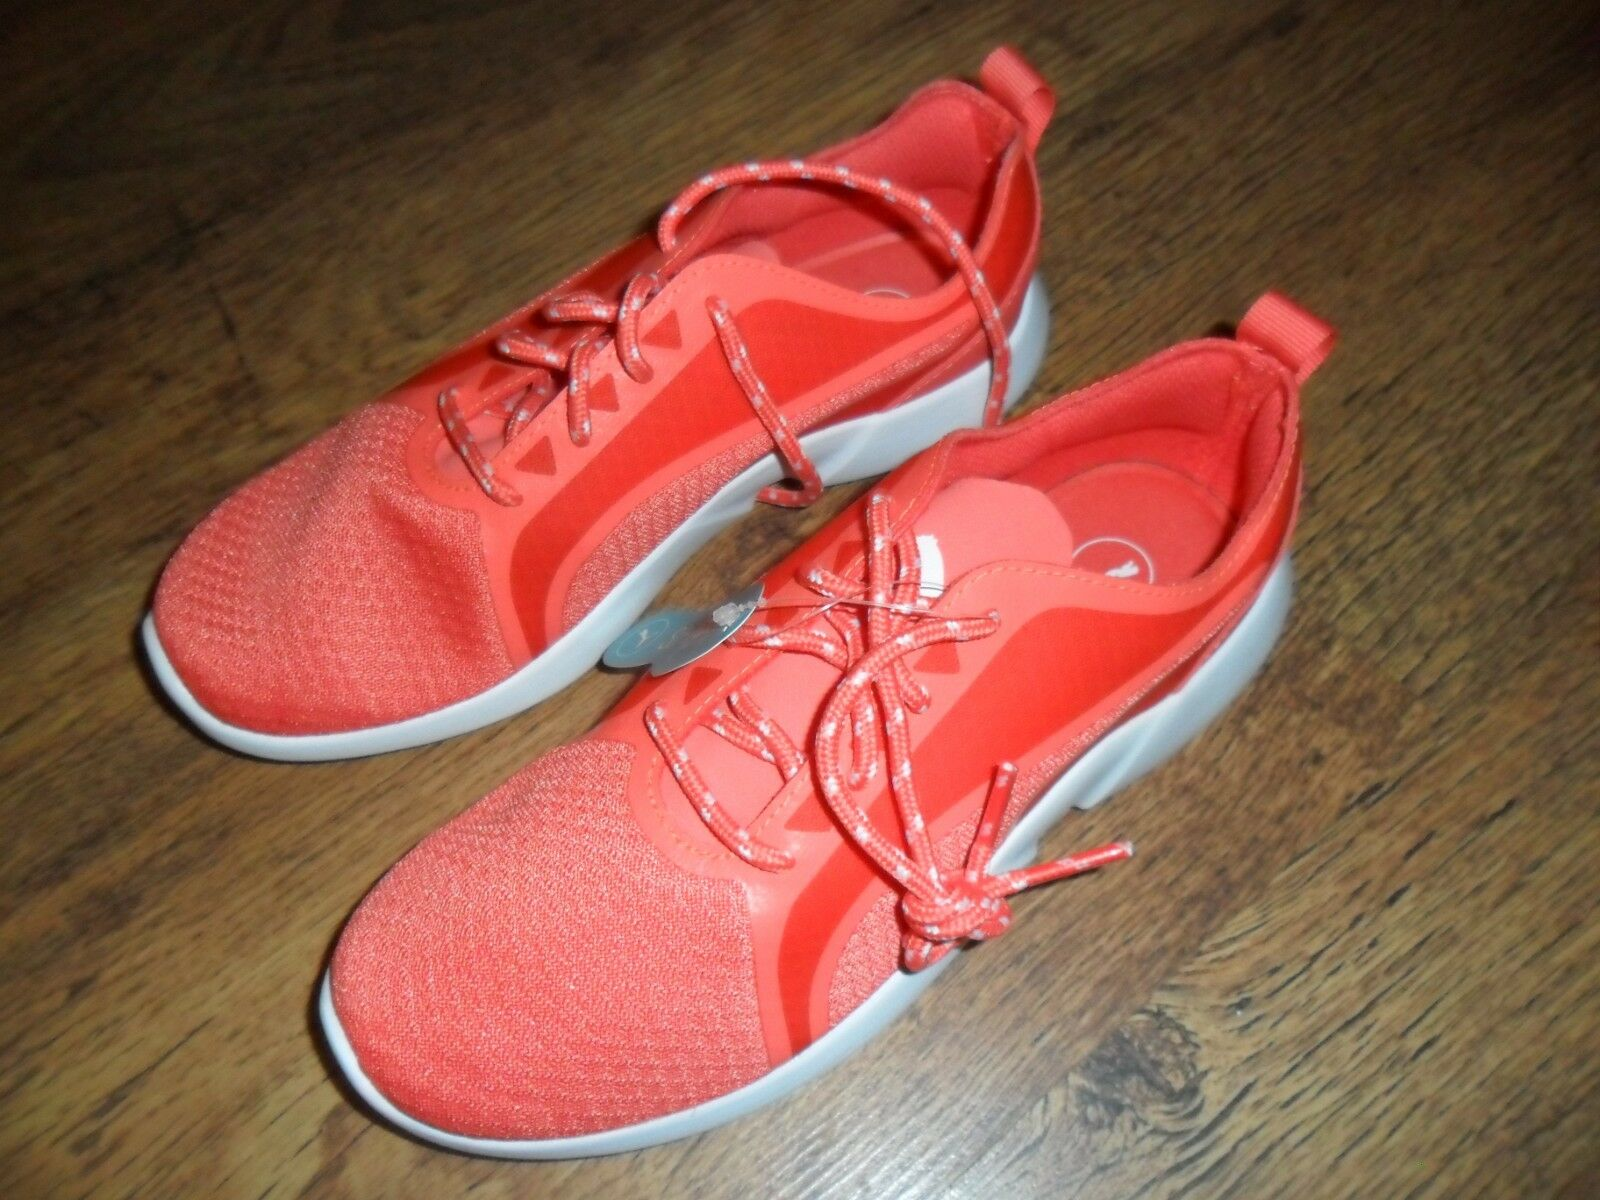 BNIB Puma Vega Evo Ladies Coral Textile Softfoam Comfort Running Trainers SIZE 3